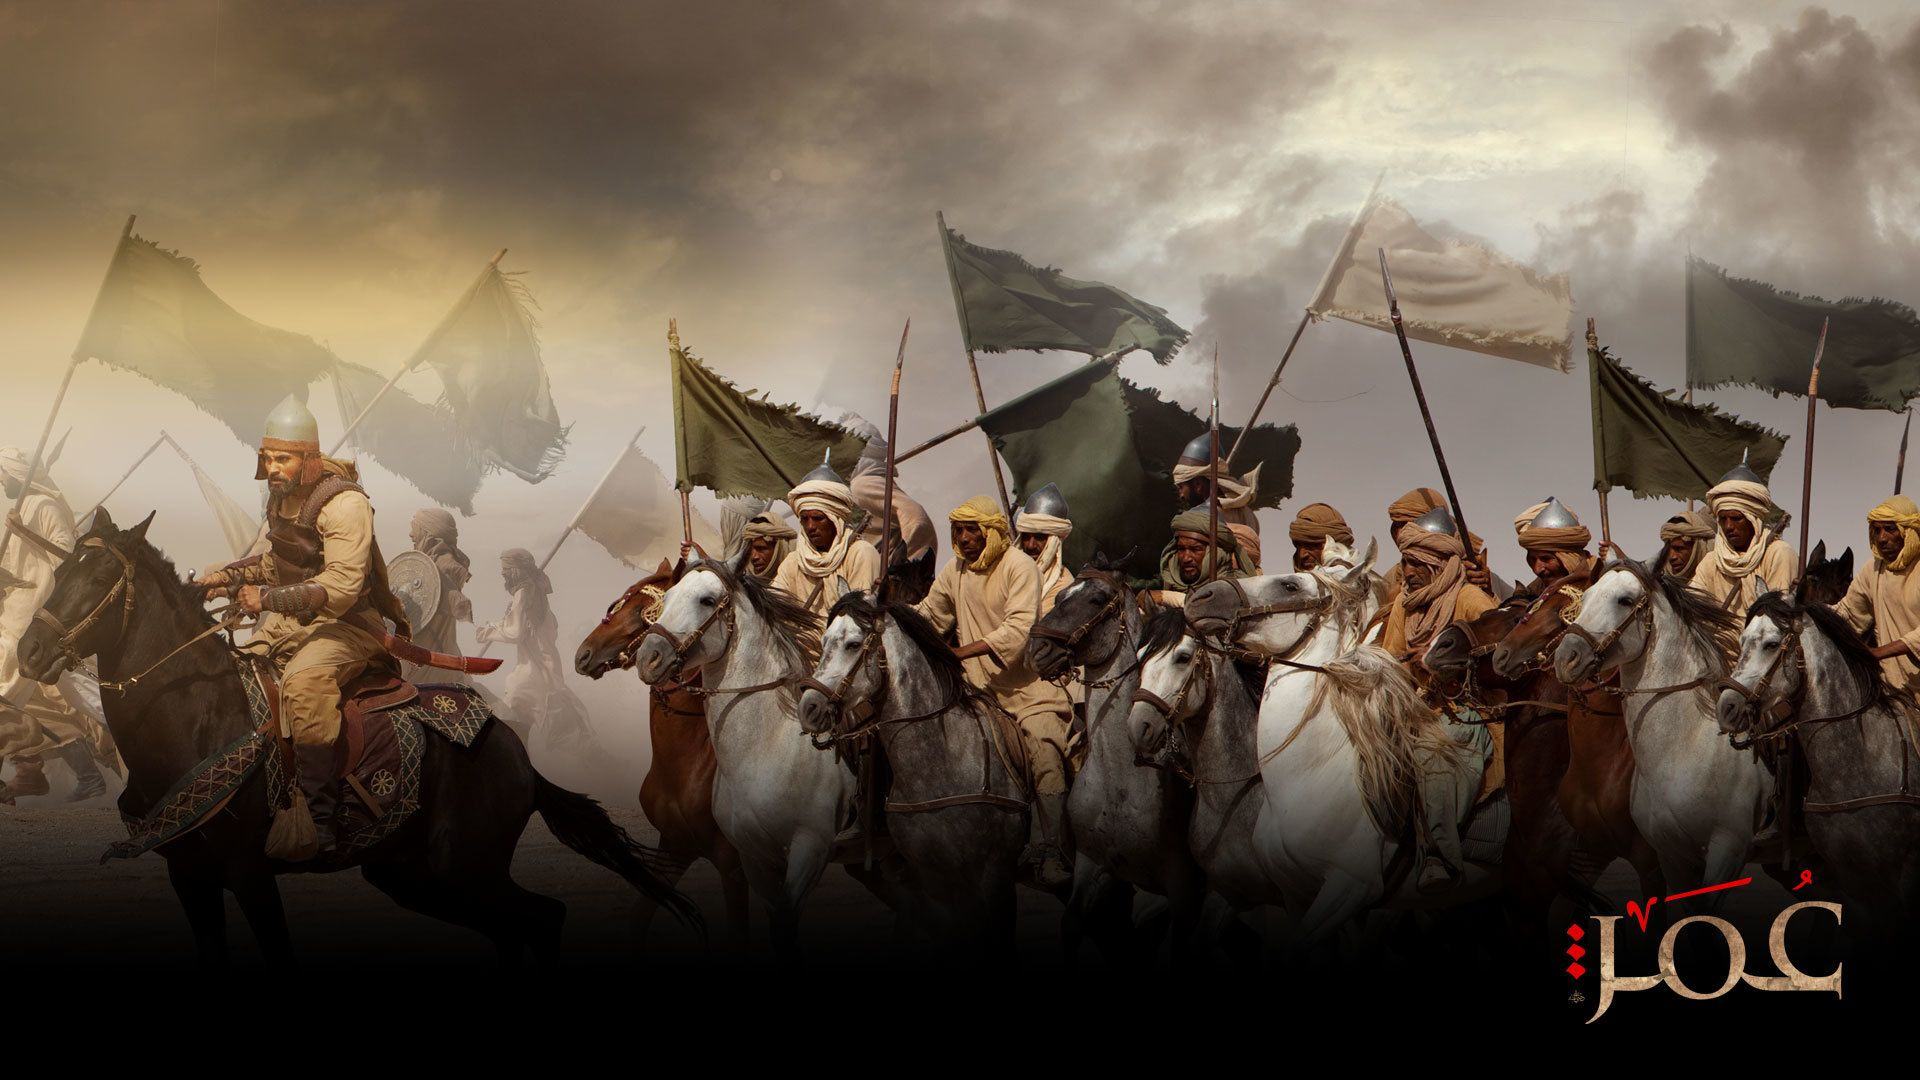 Season 01, Episode 01 Umar during his youth